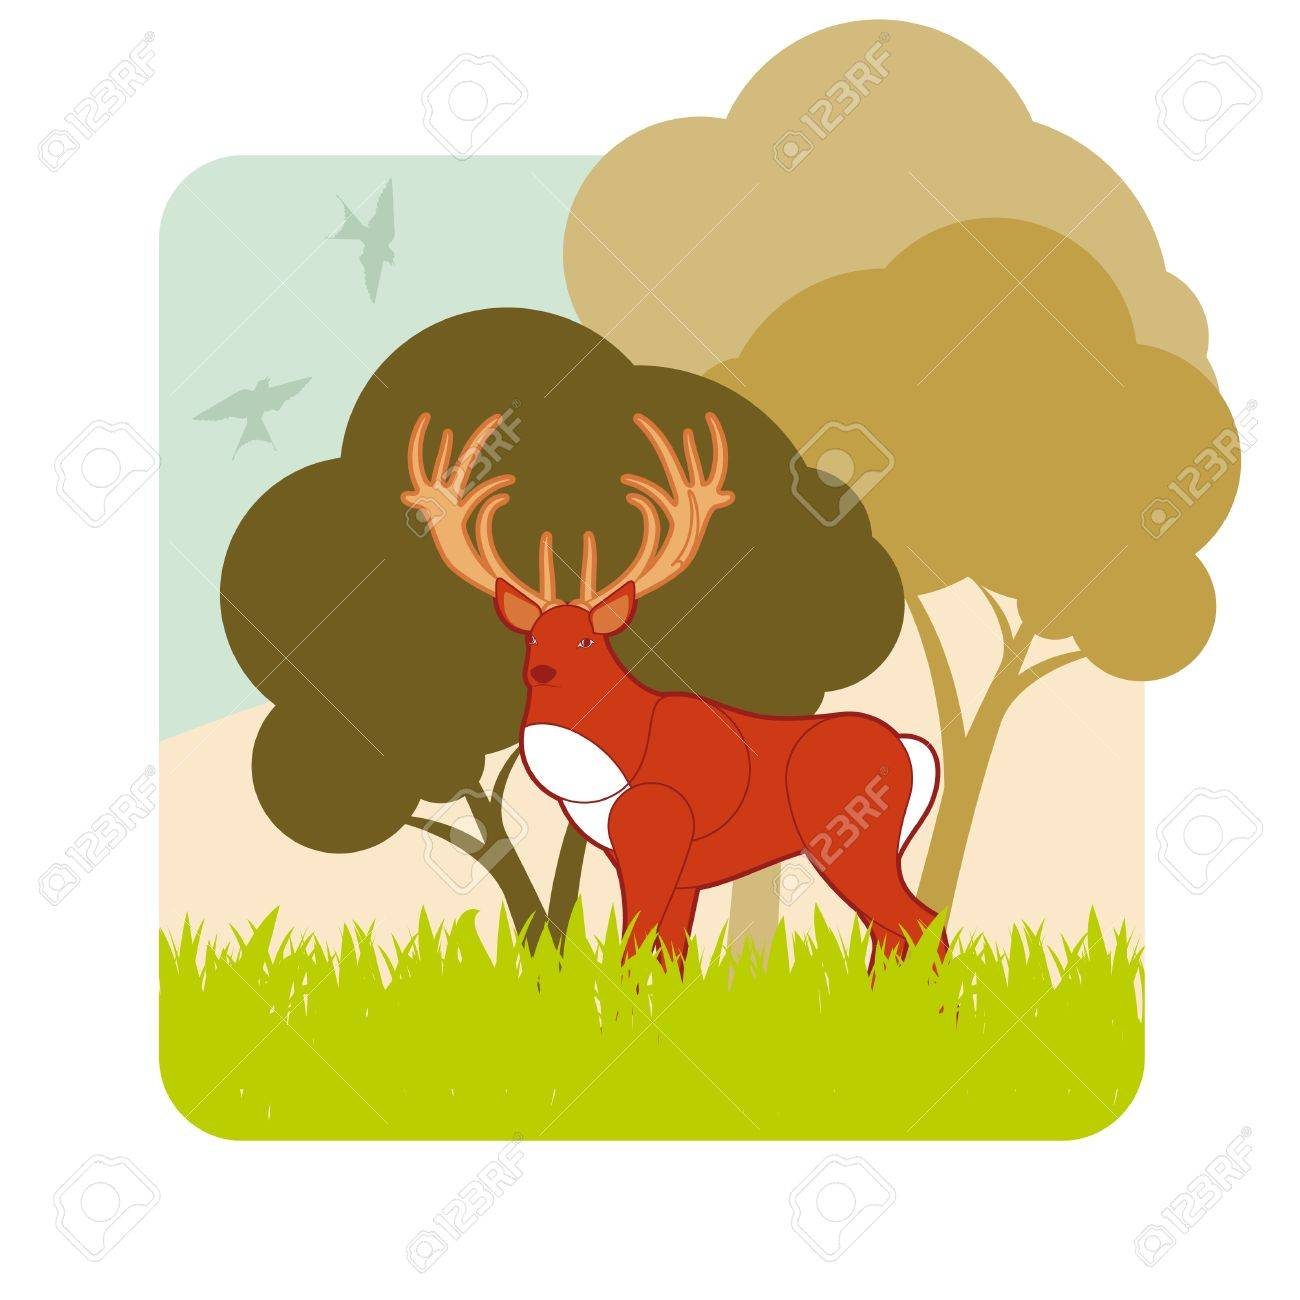 Animated dear hunting season foliage Stock Vector - 10510673